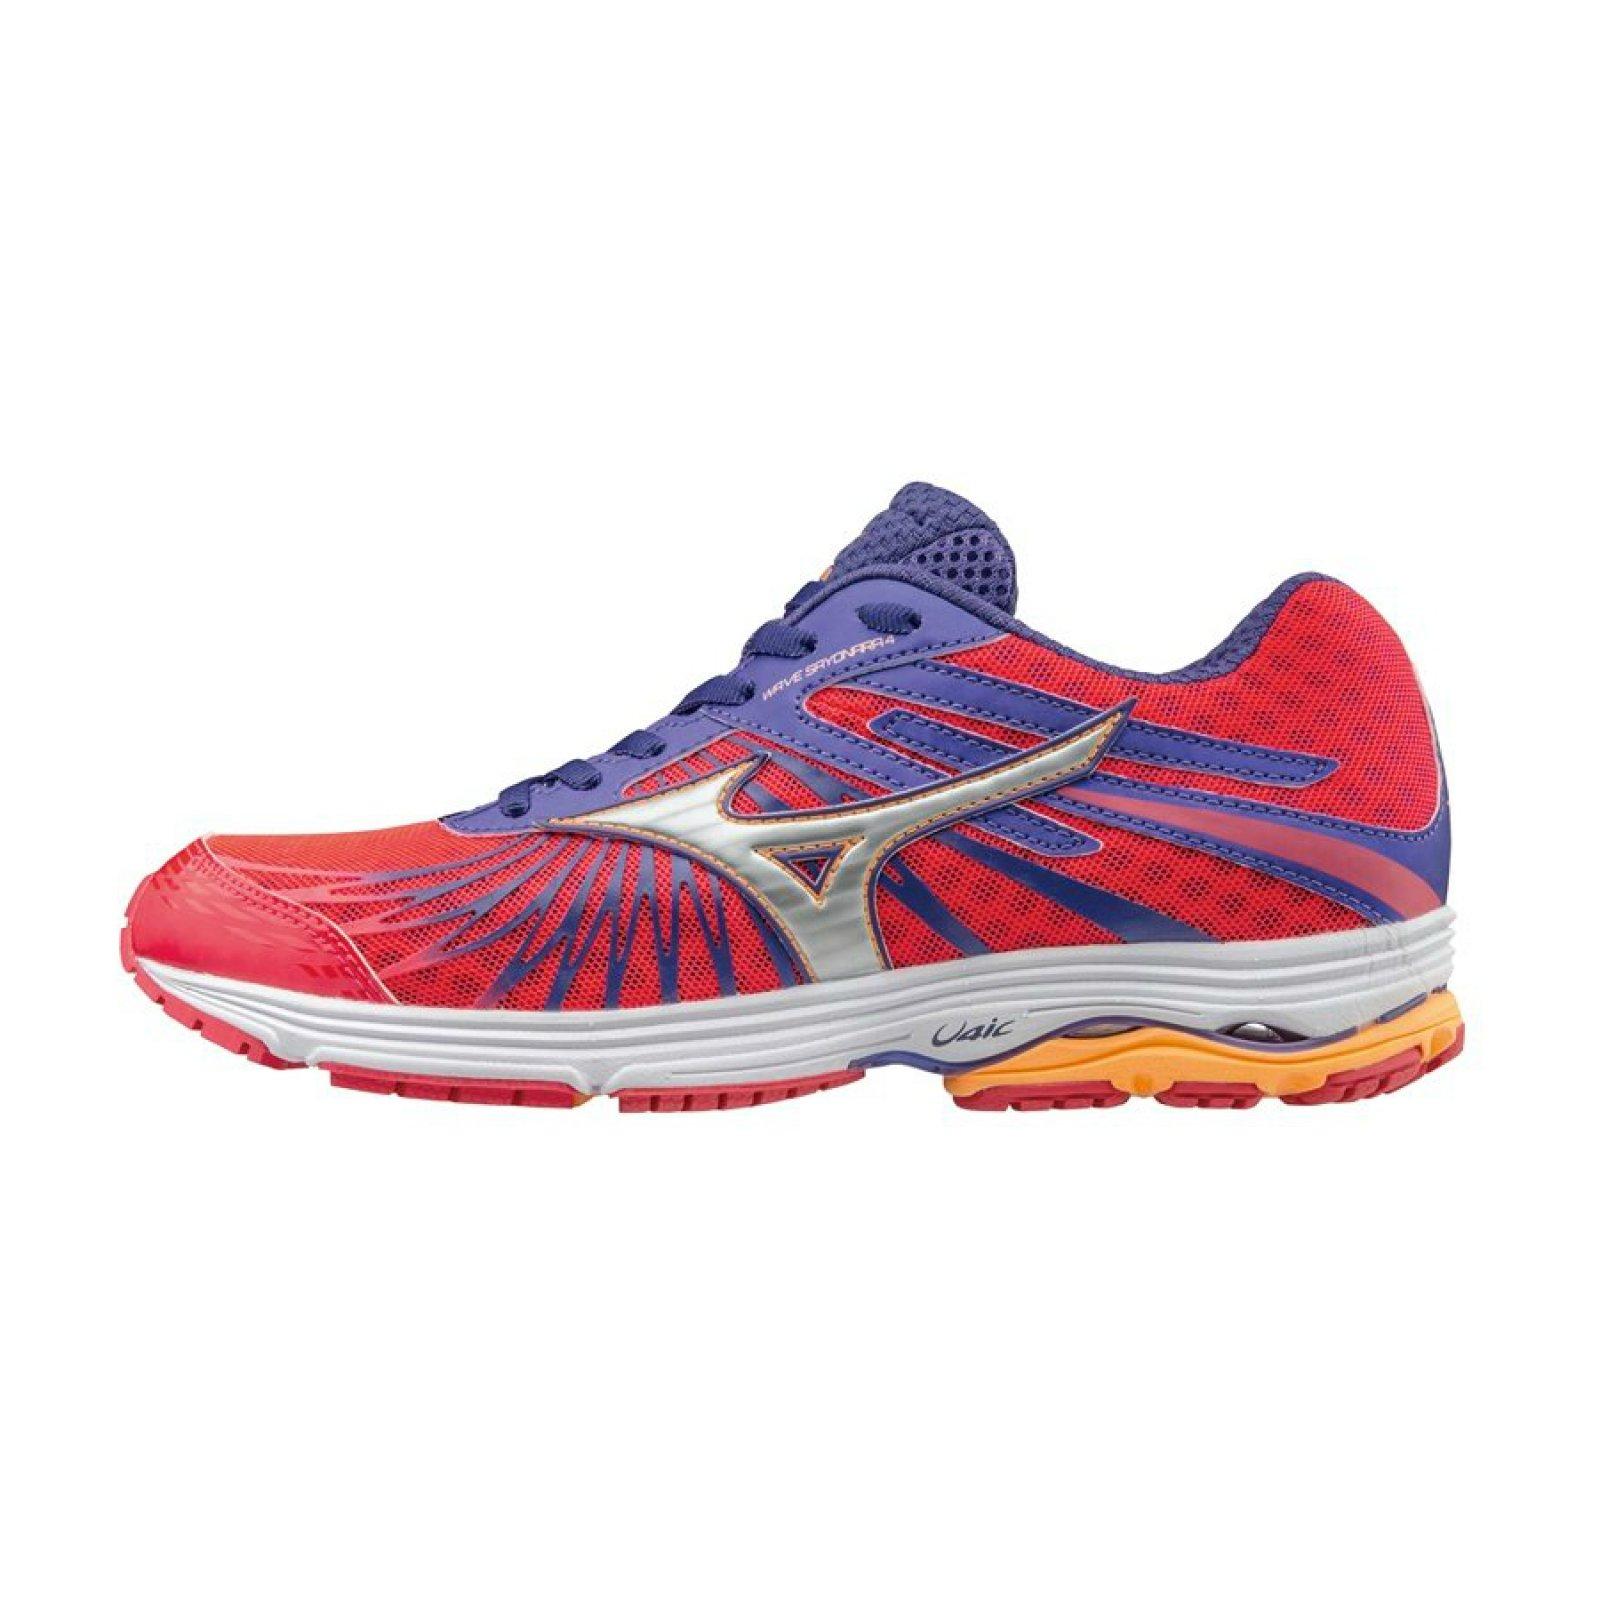 Silniční běžecké boty Mizuno Wave Sayonara 4 W J1GD163004 - Actisport.cz cf0b80620e4